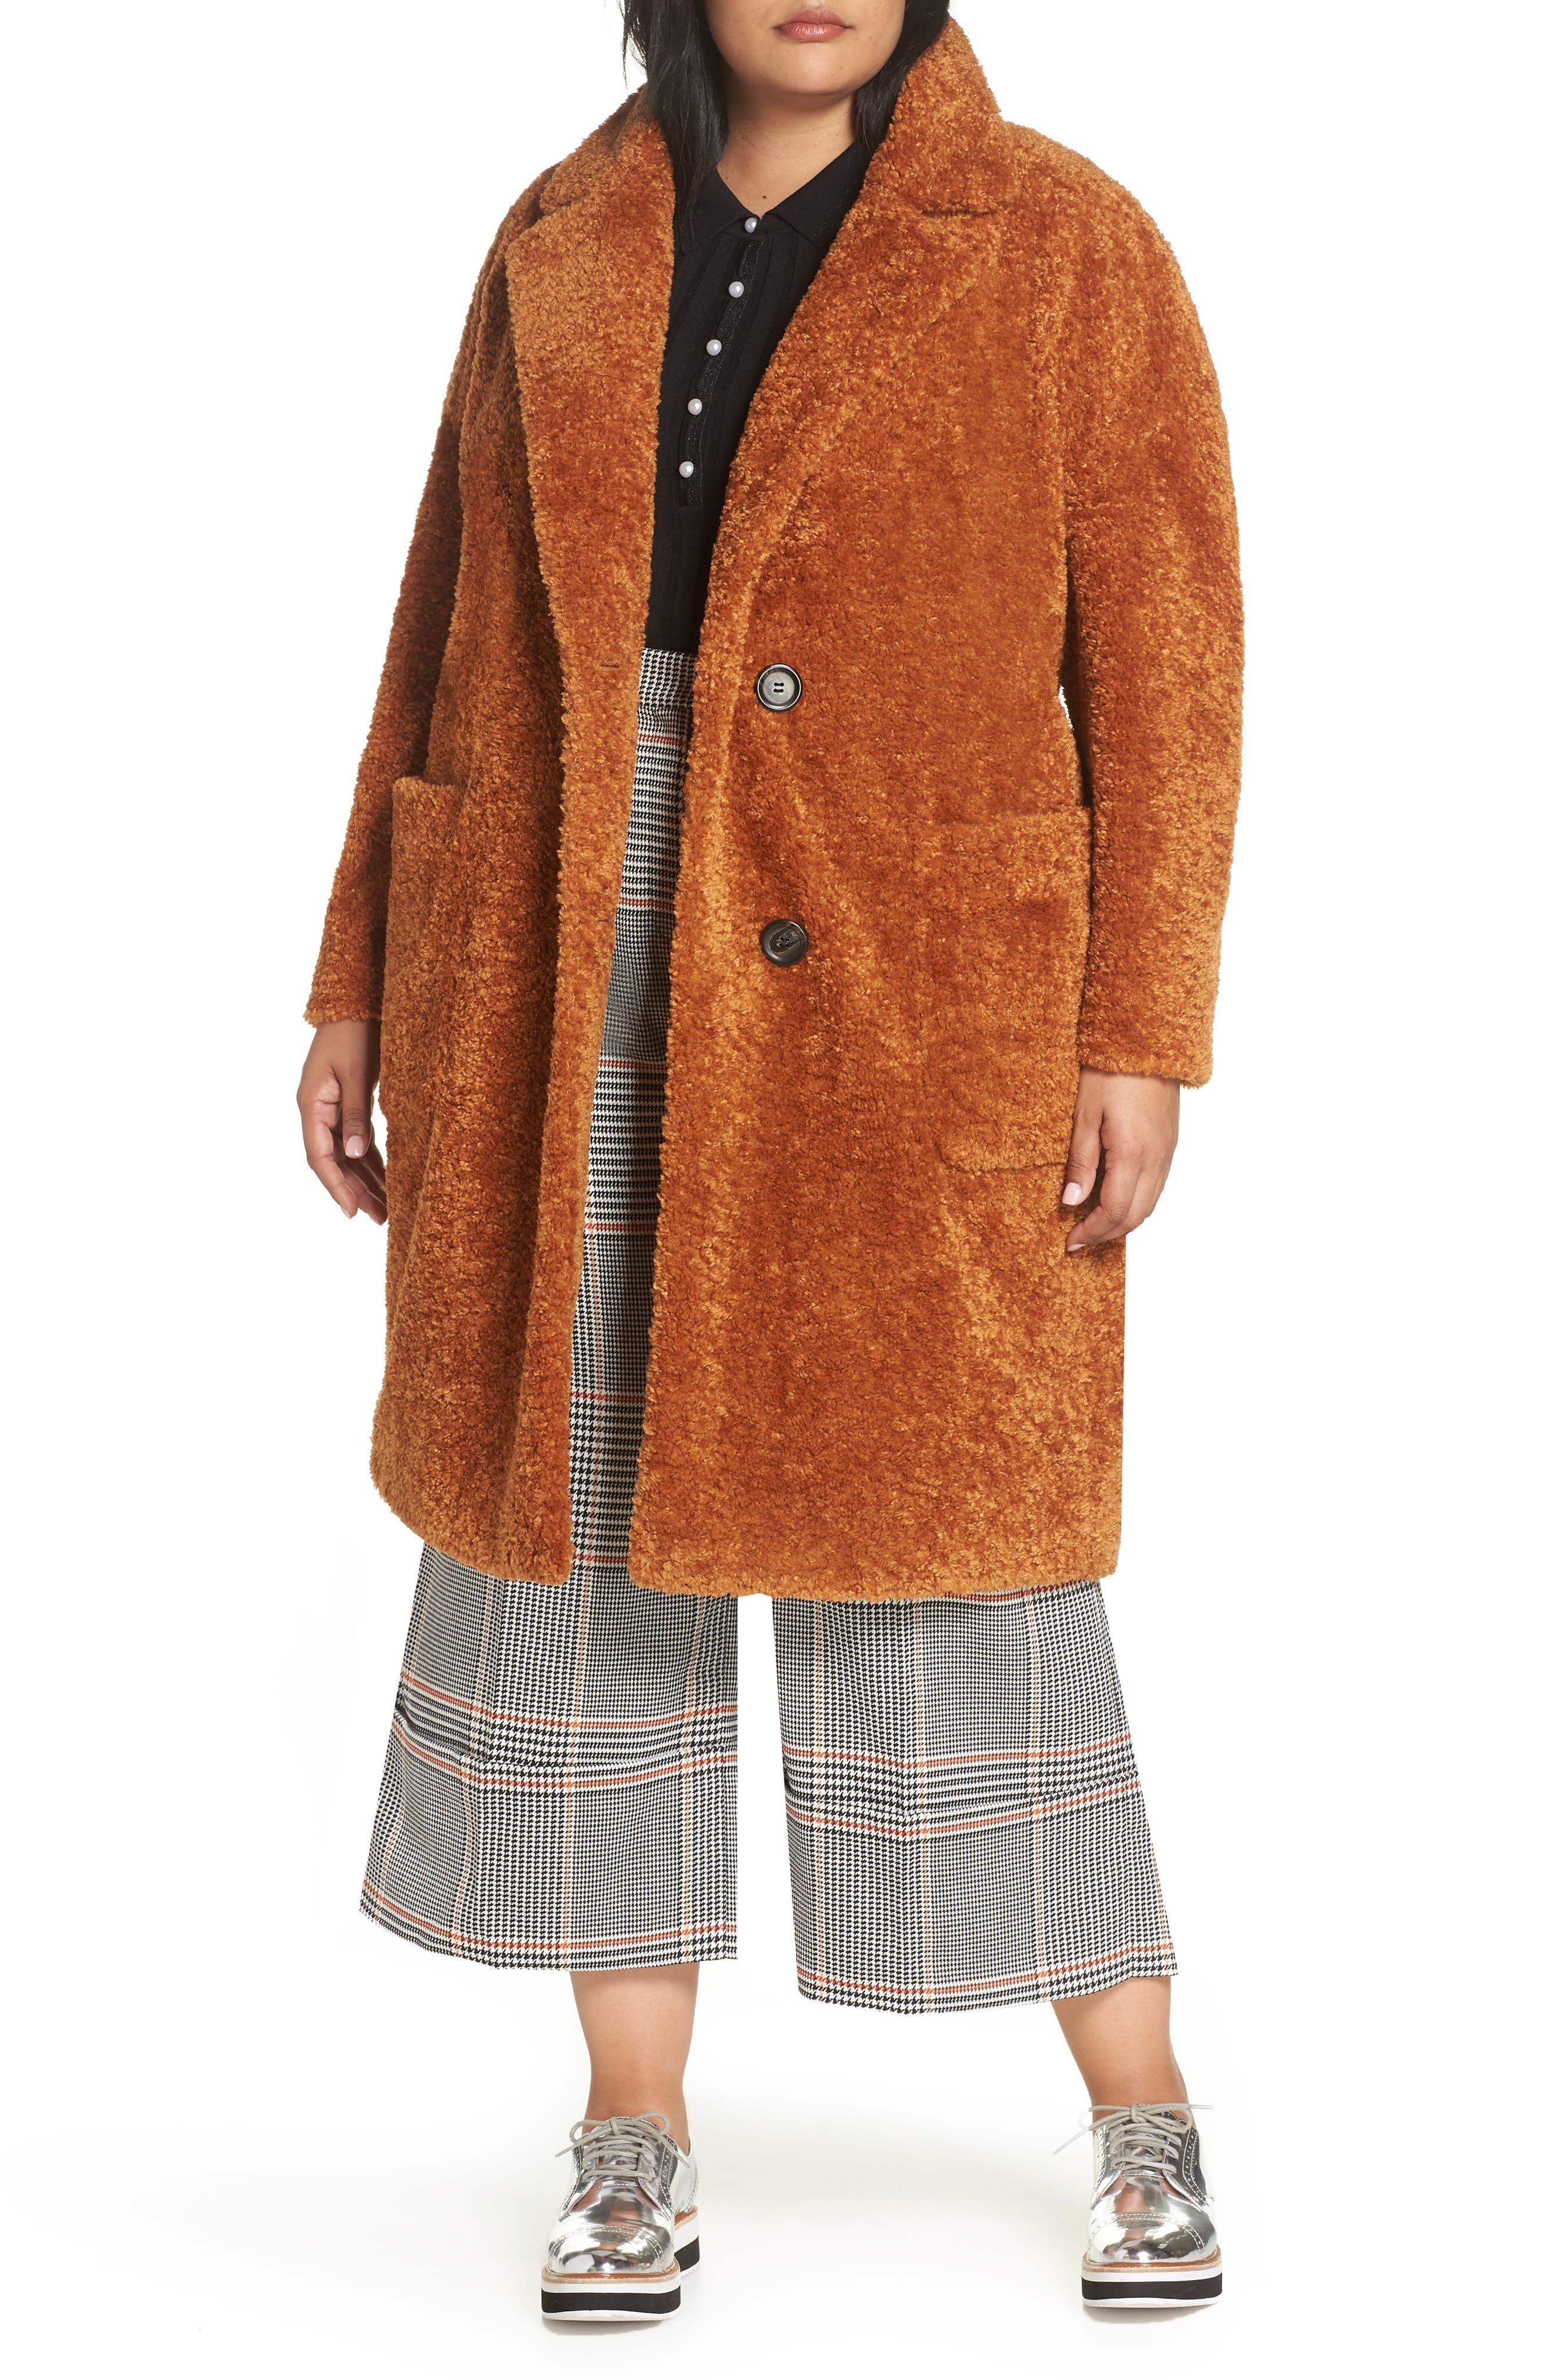 x Atlantic-Pacific Faux Fur Coat,                             Main thumbnail 1, color,                             219